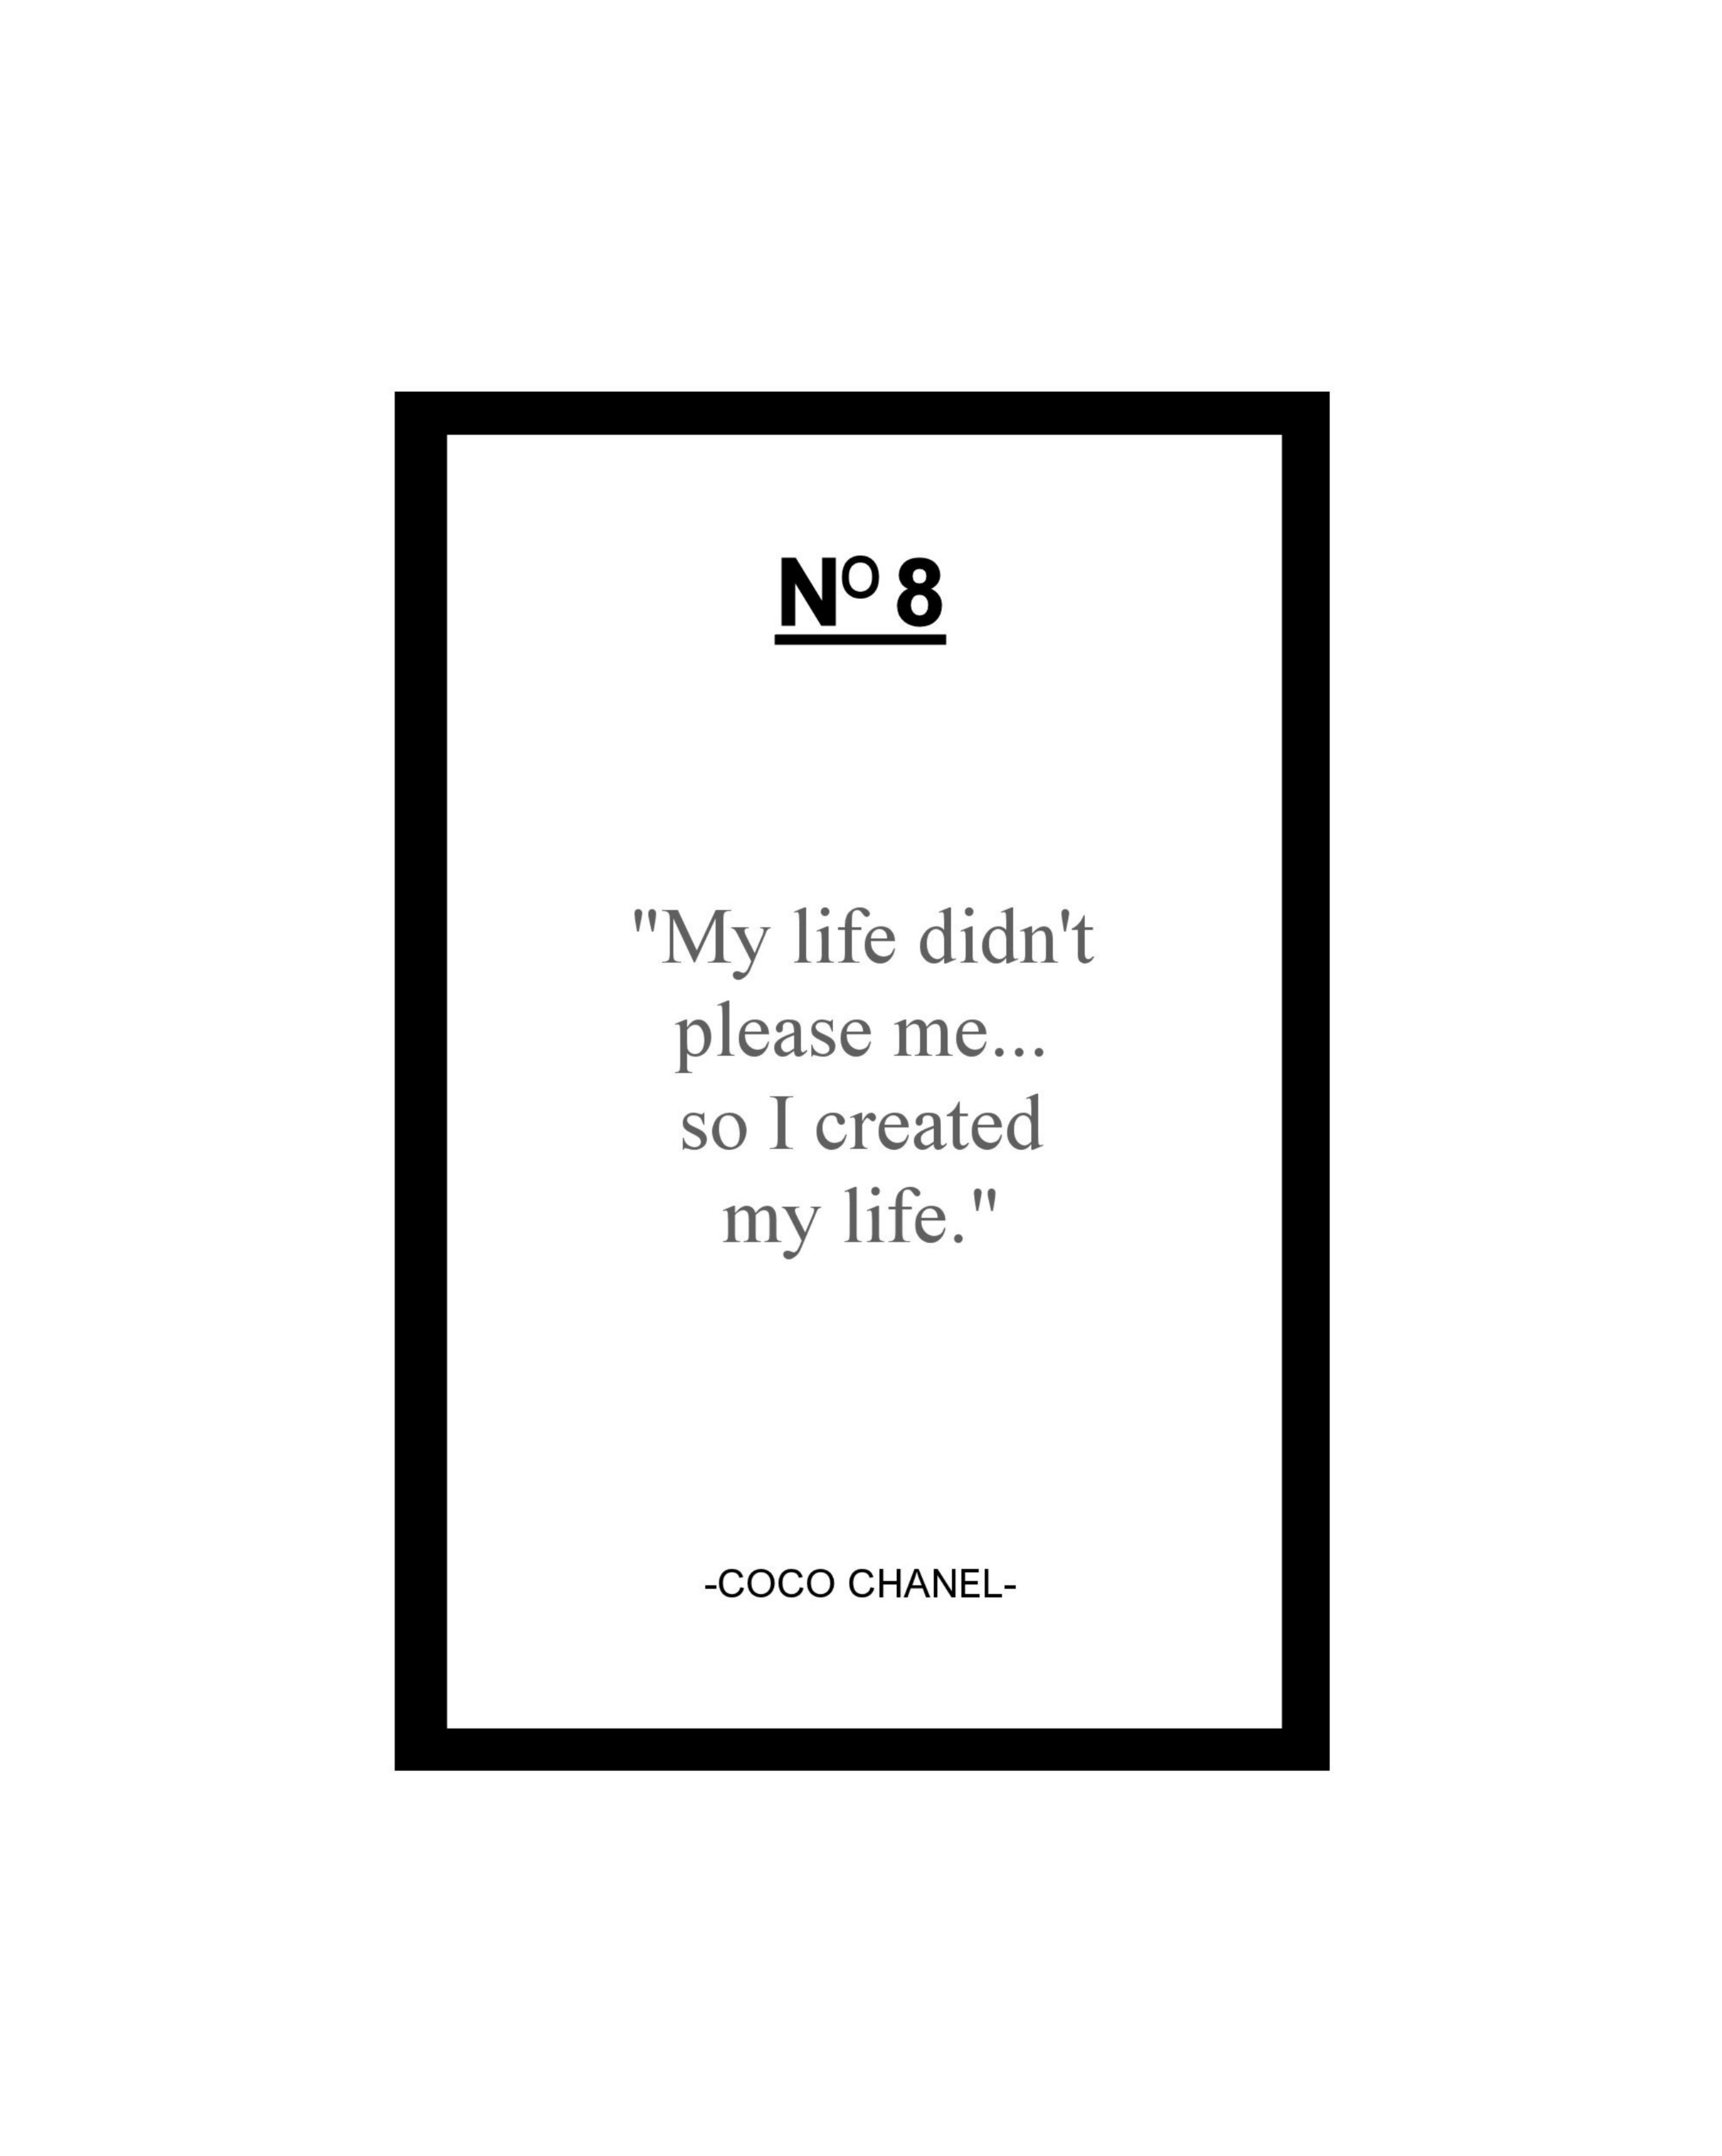 coco chanel quote card